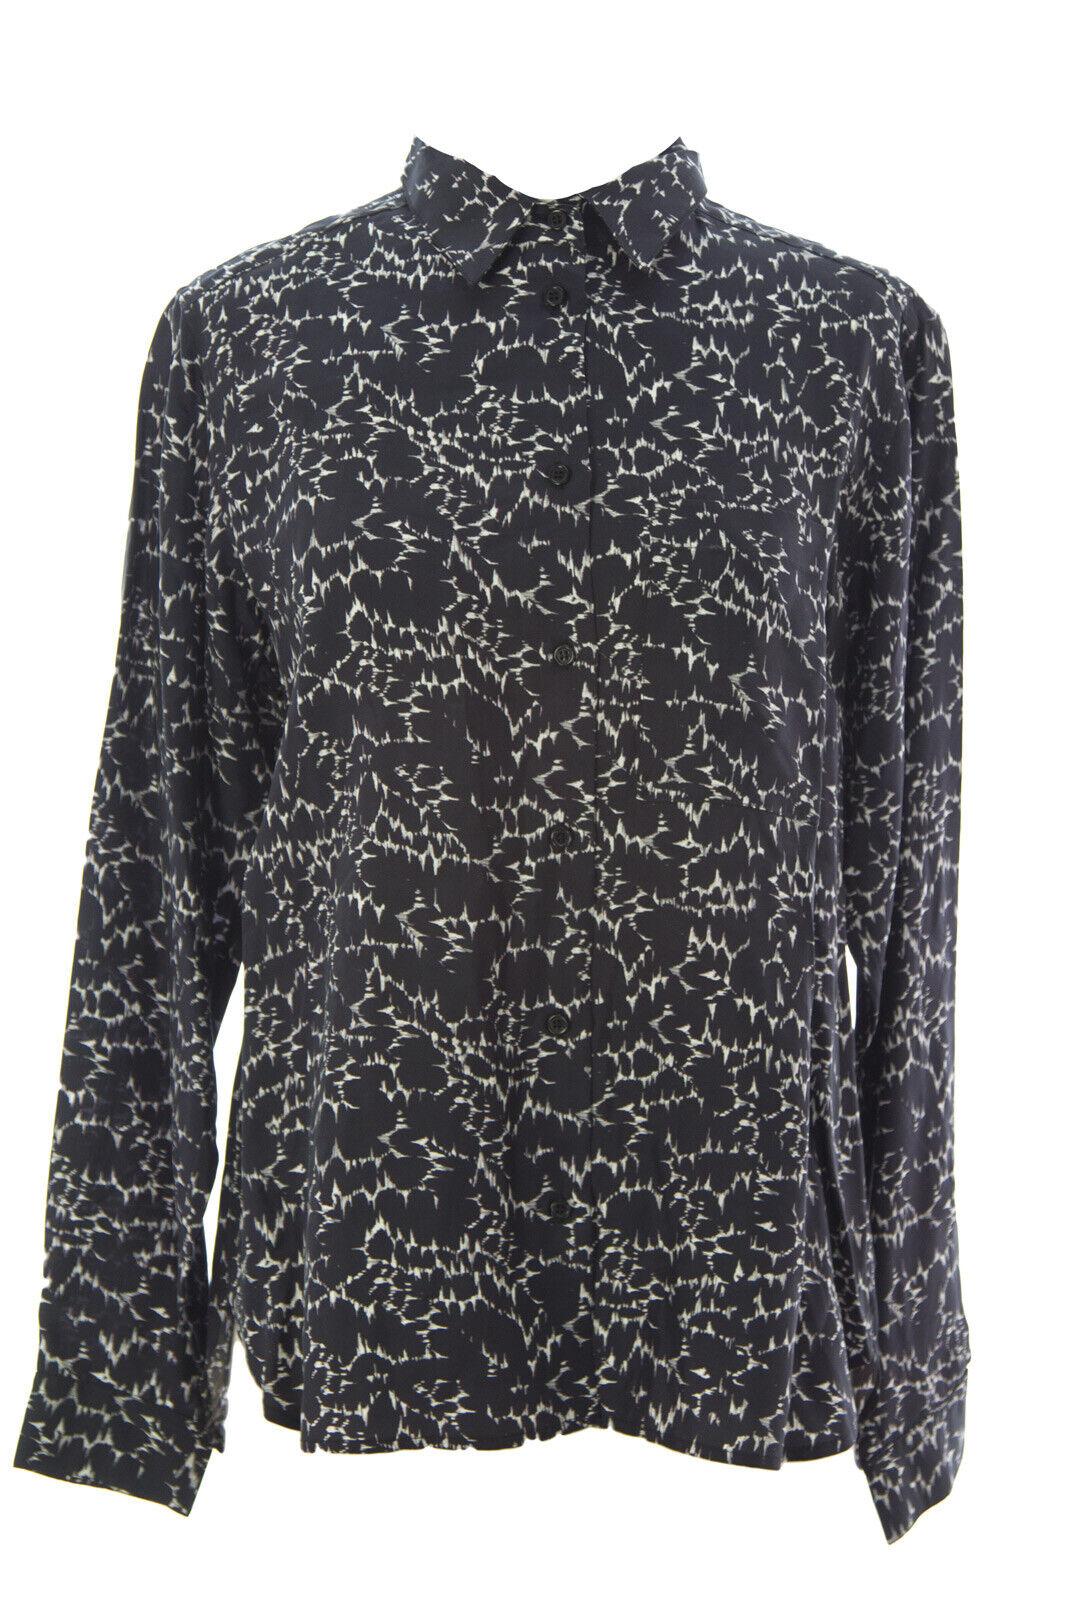 Surface To Luft Damen schwarz Lightning Zulu Shirt Größe 40